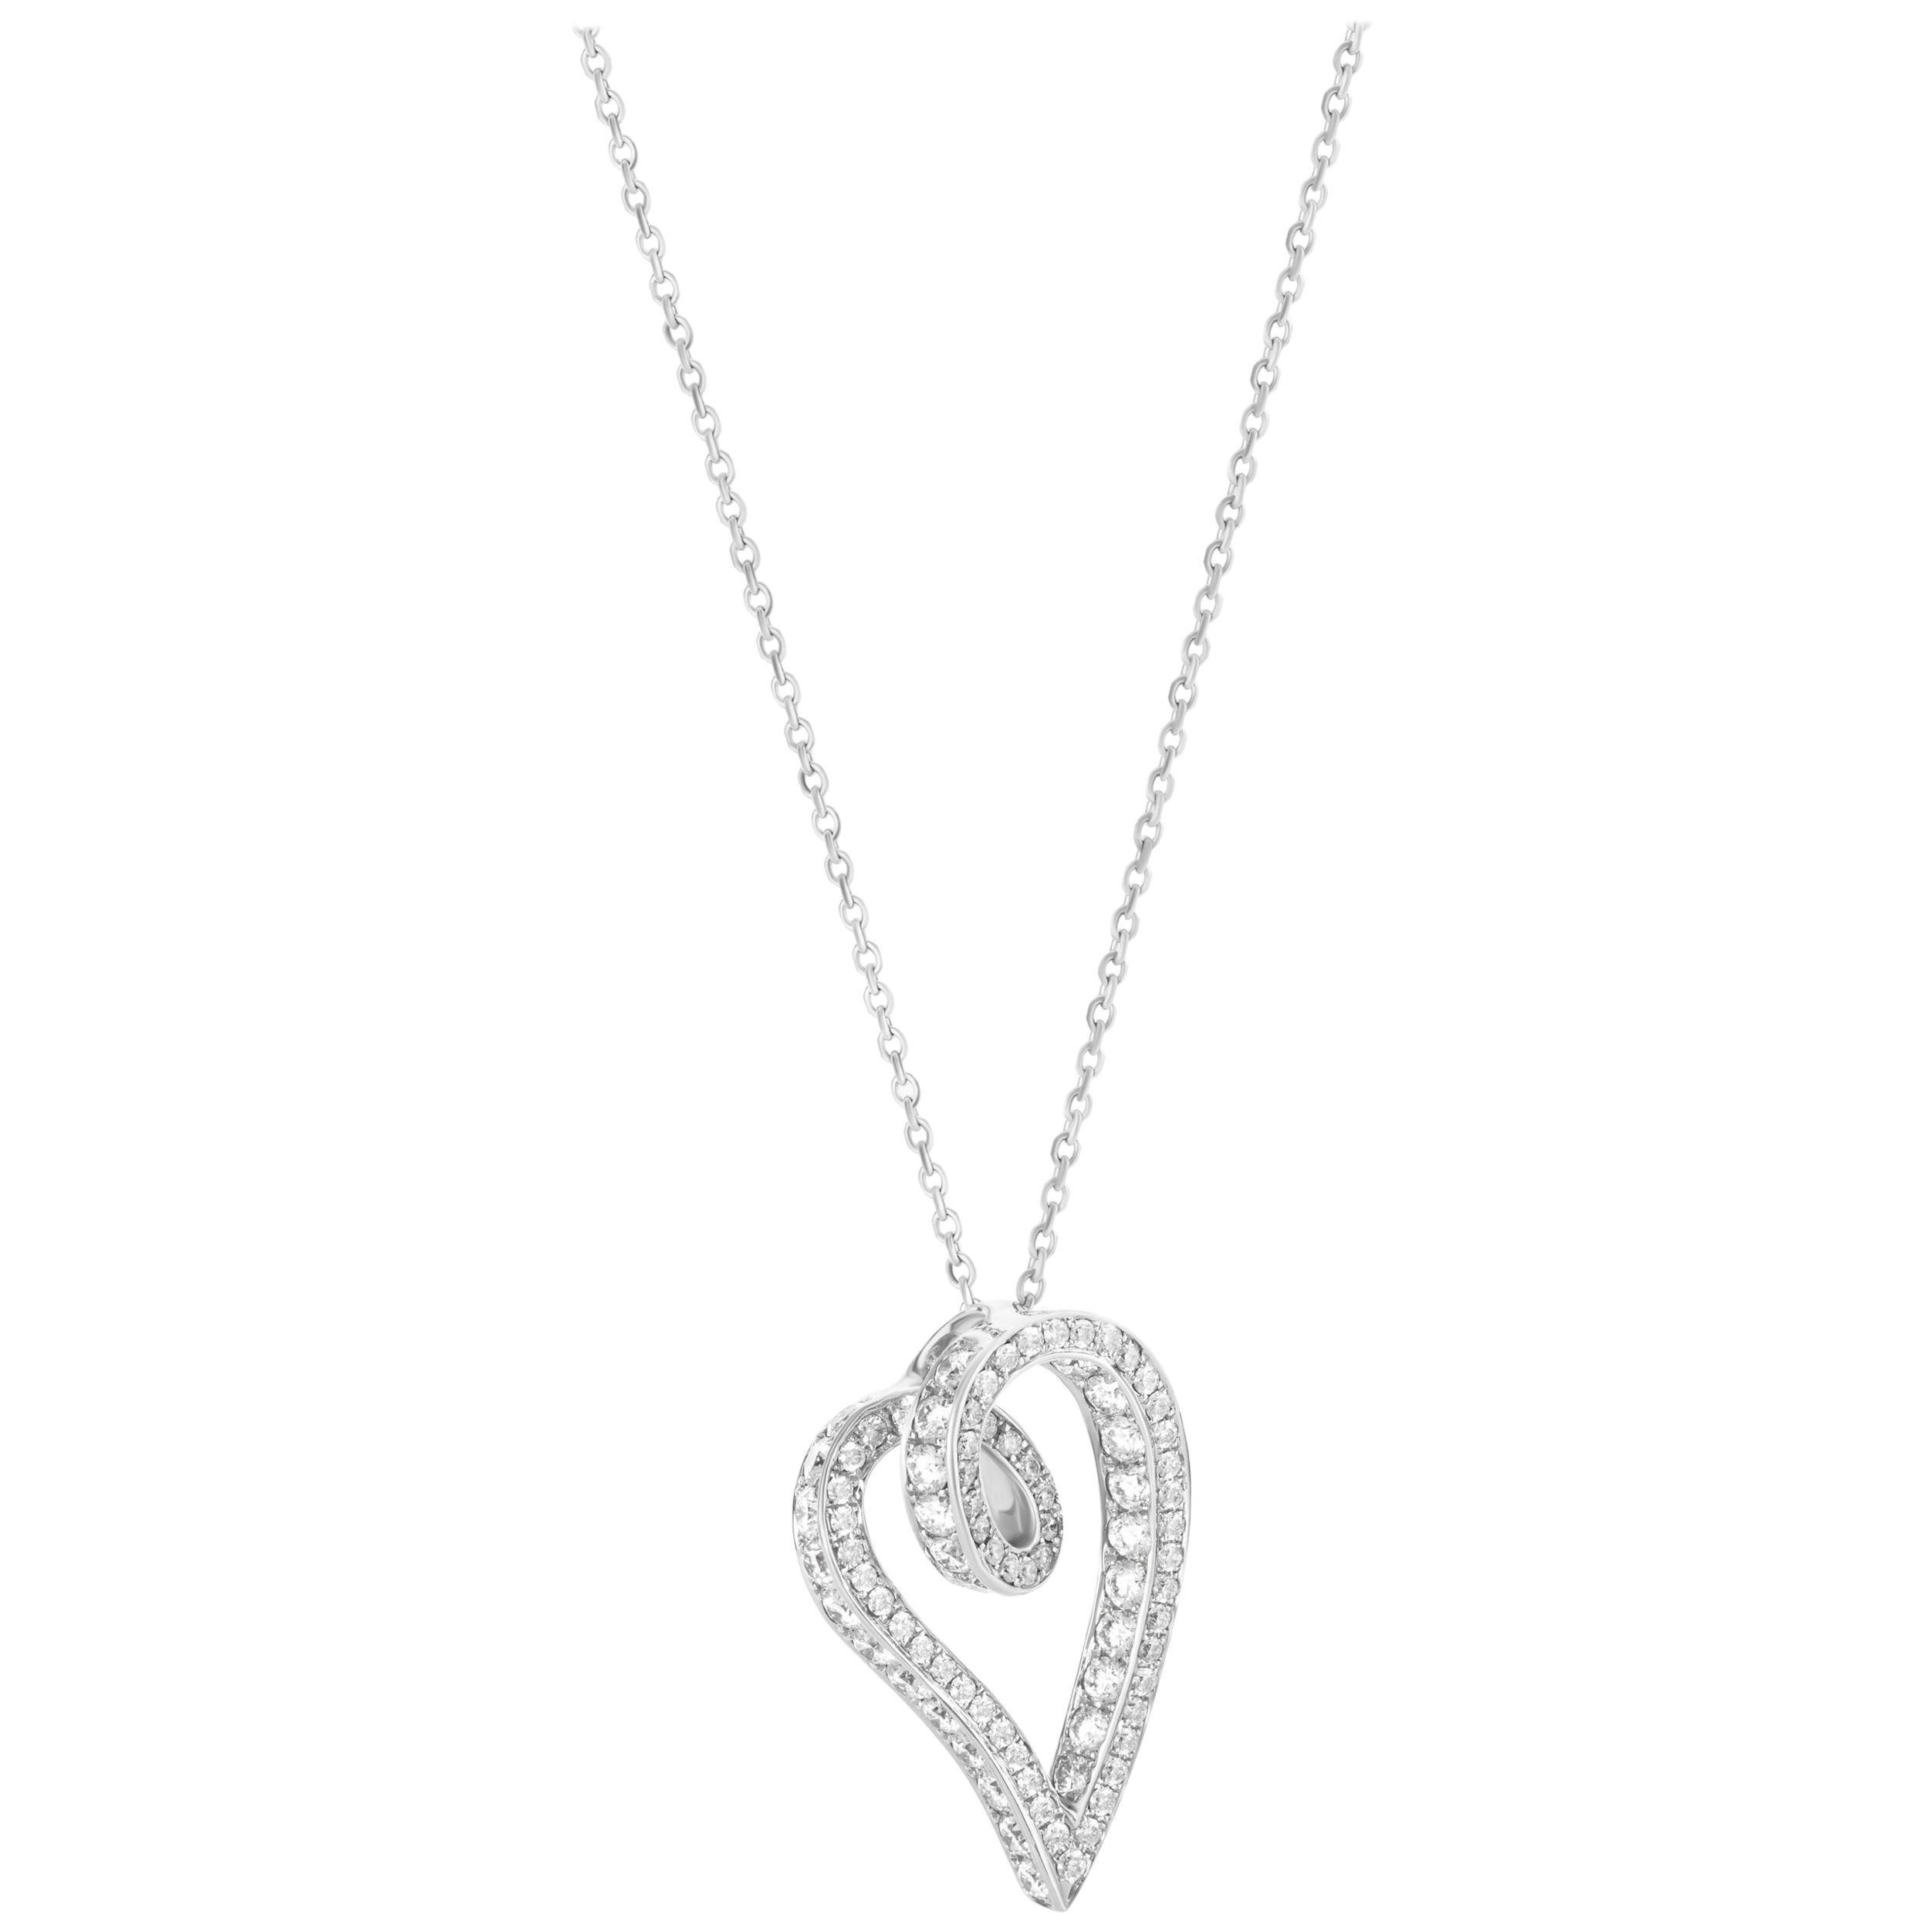 1.78 Carat Diamond 18 Karat White Gold Open Heart Pendant Necklace